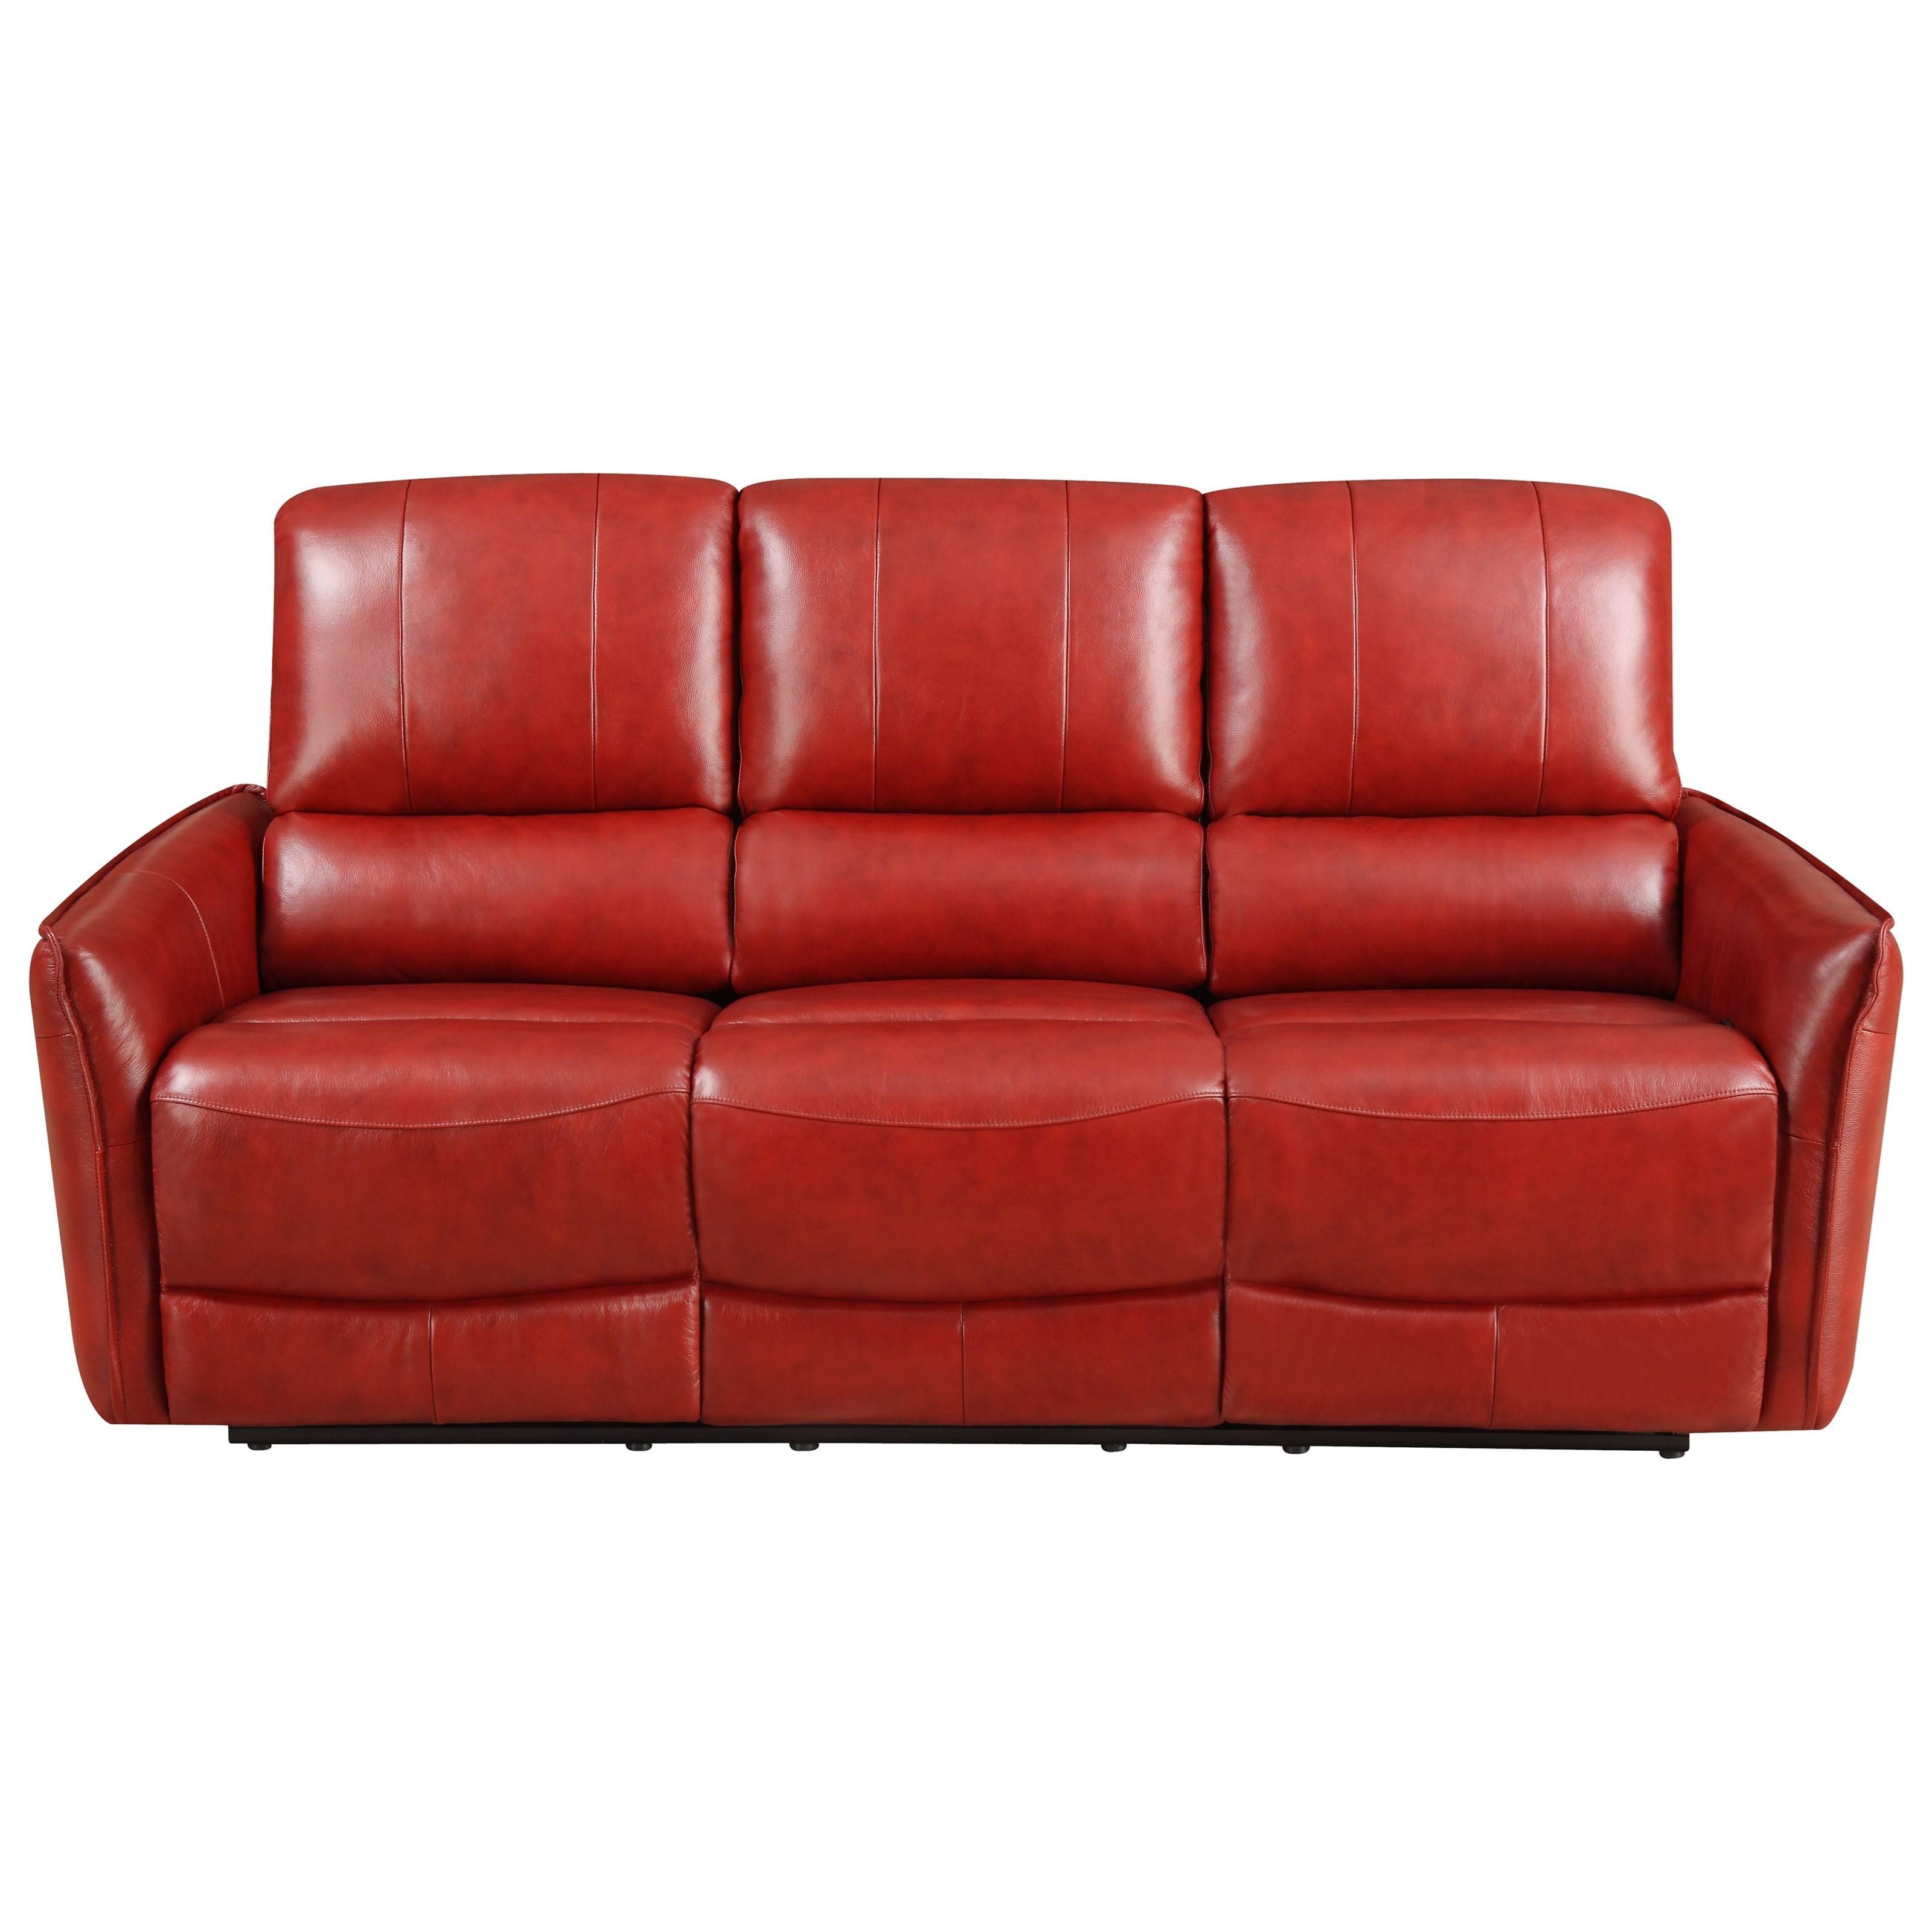 Klaussner International Adonis Reclining Sofa Red Knot